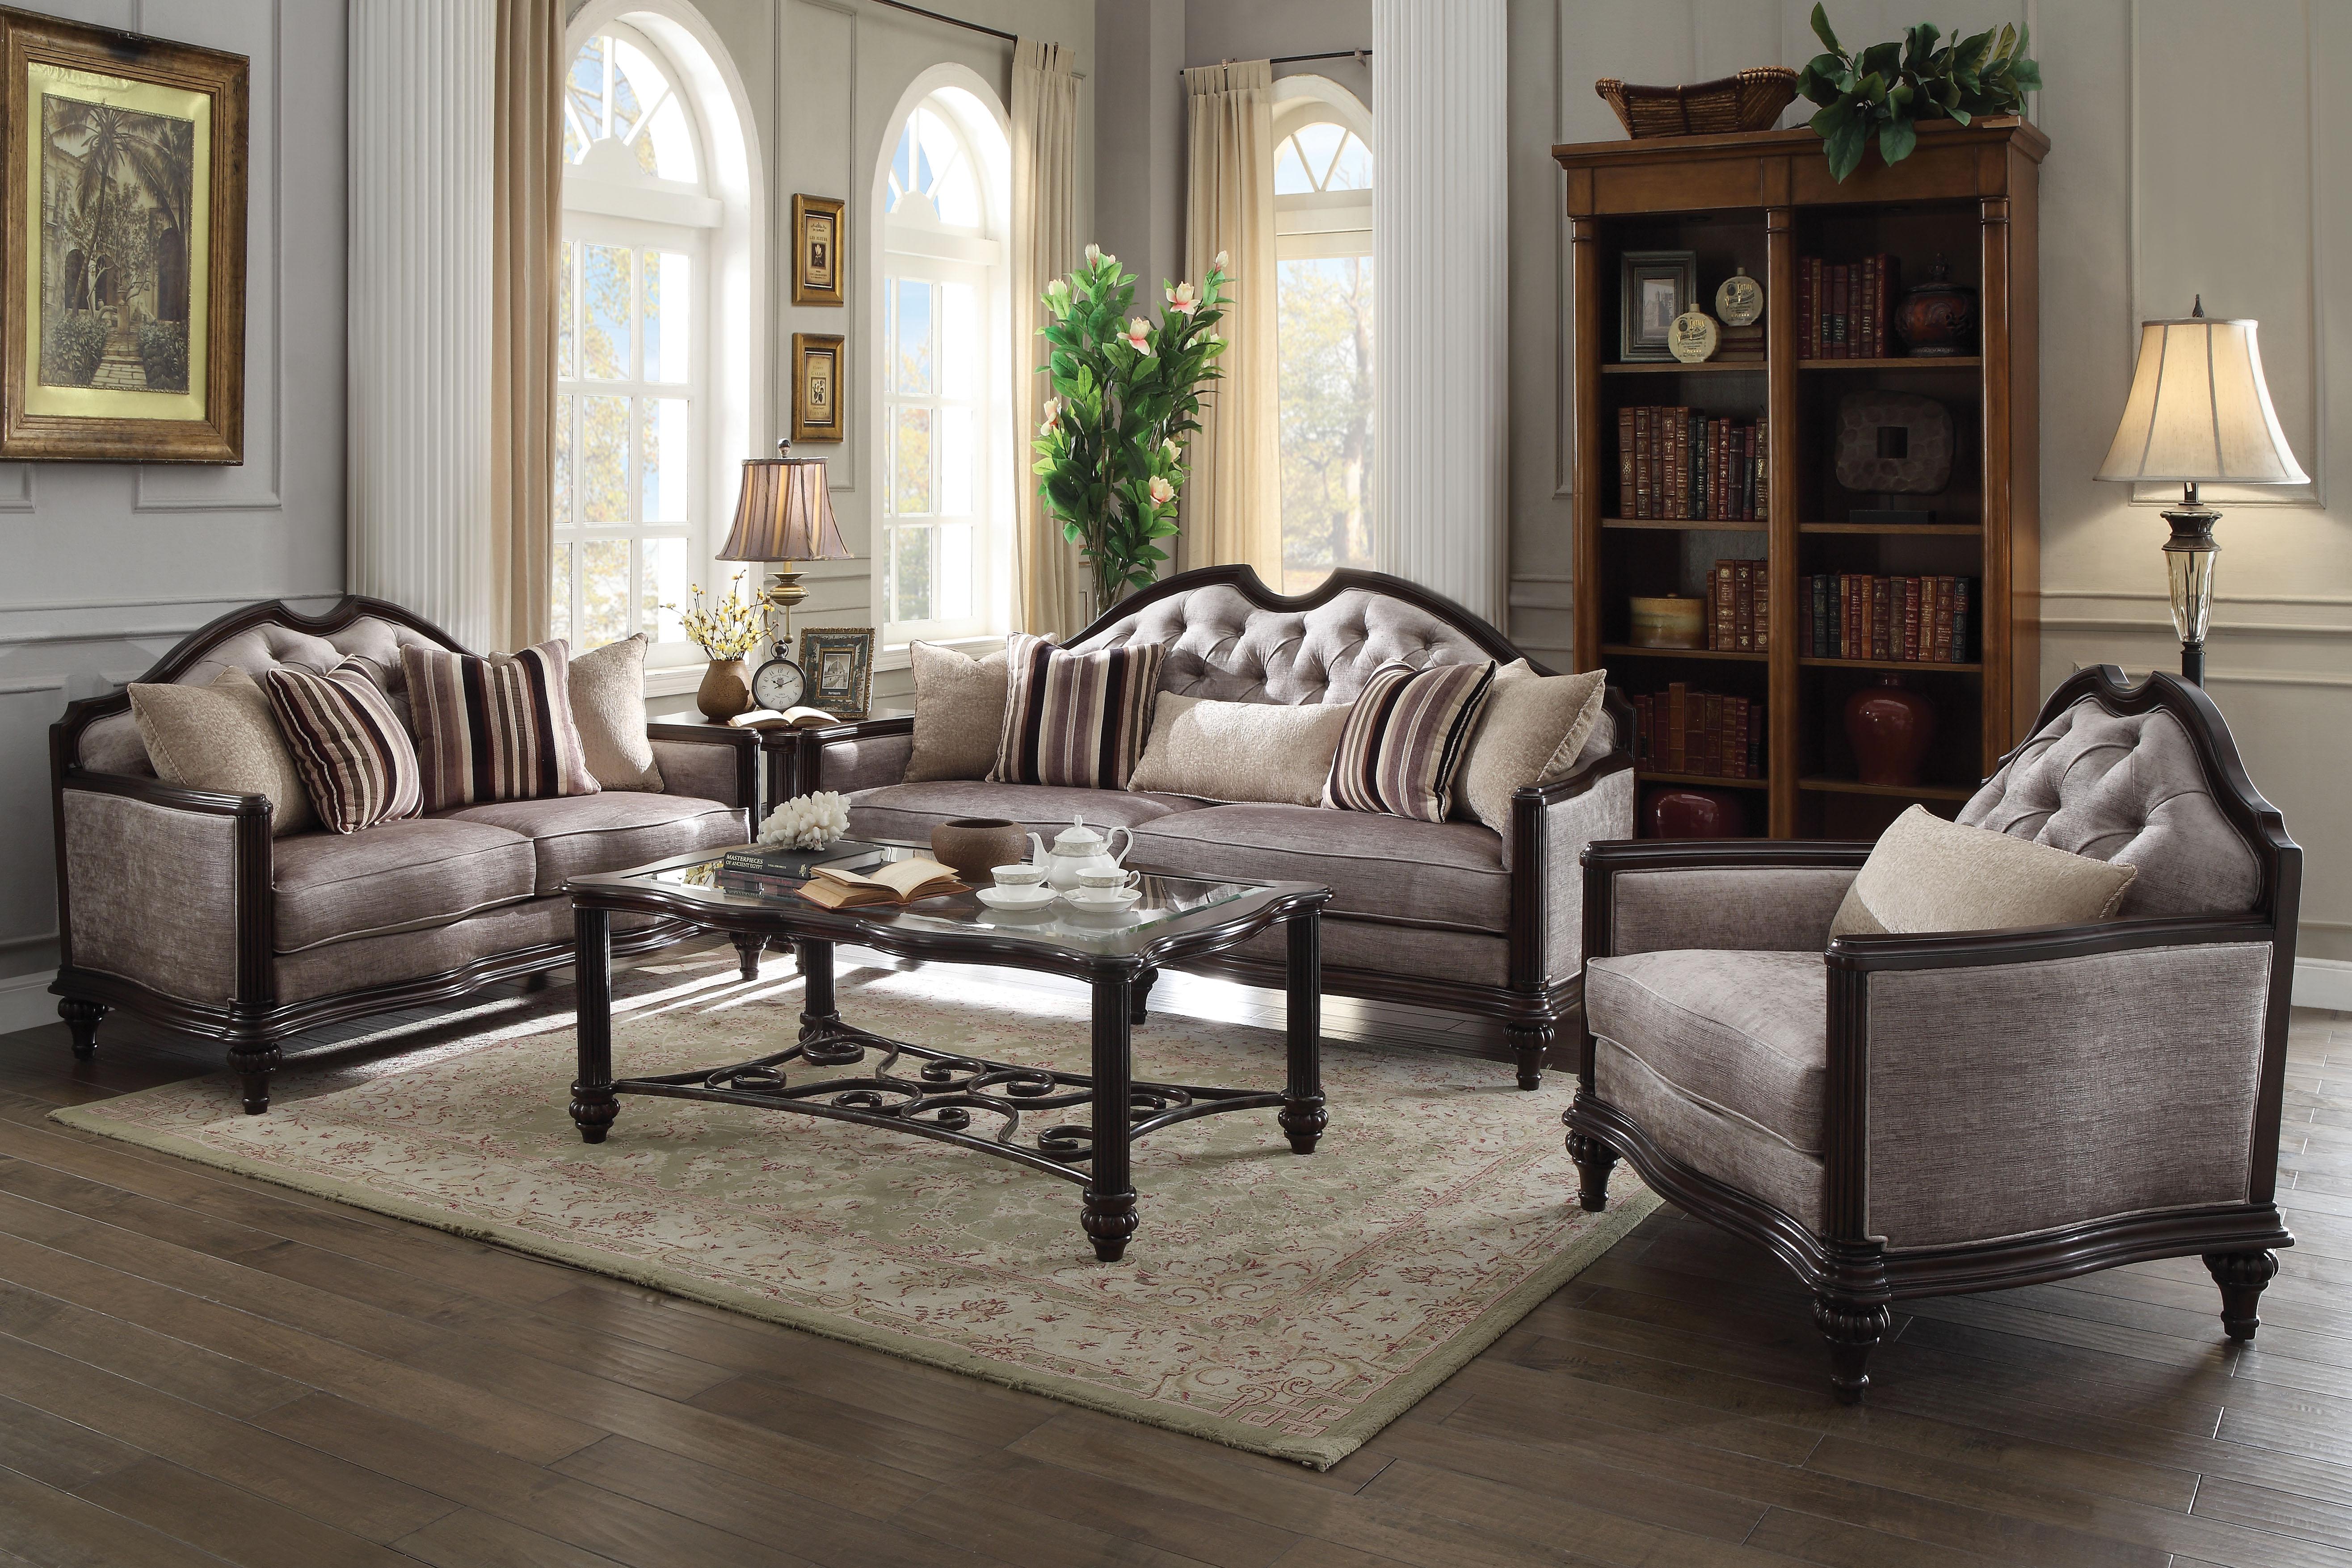 Azis Gray Fabric U0026 Dark Walnut Sofa W/5 Pillows,Acme